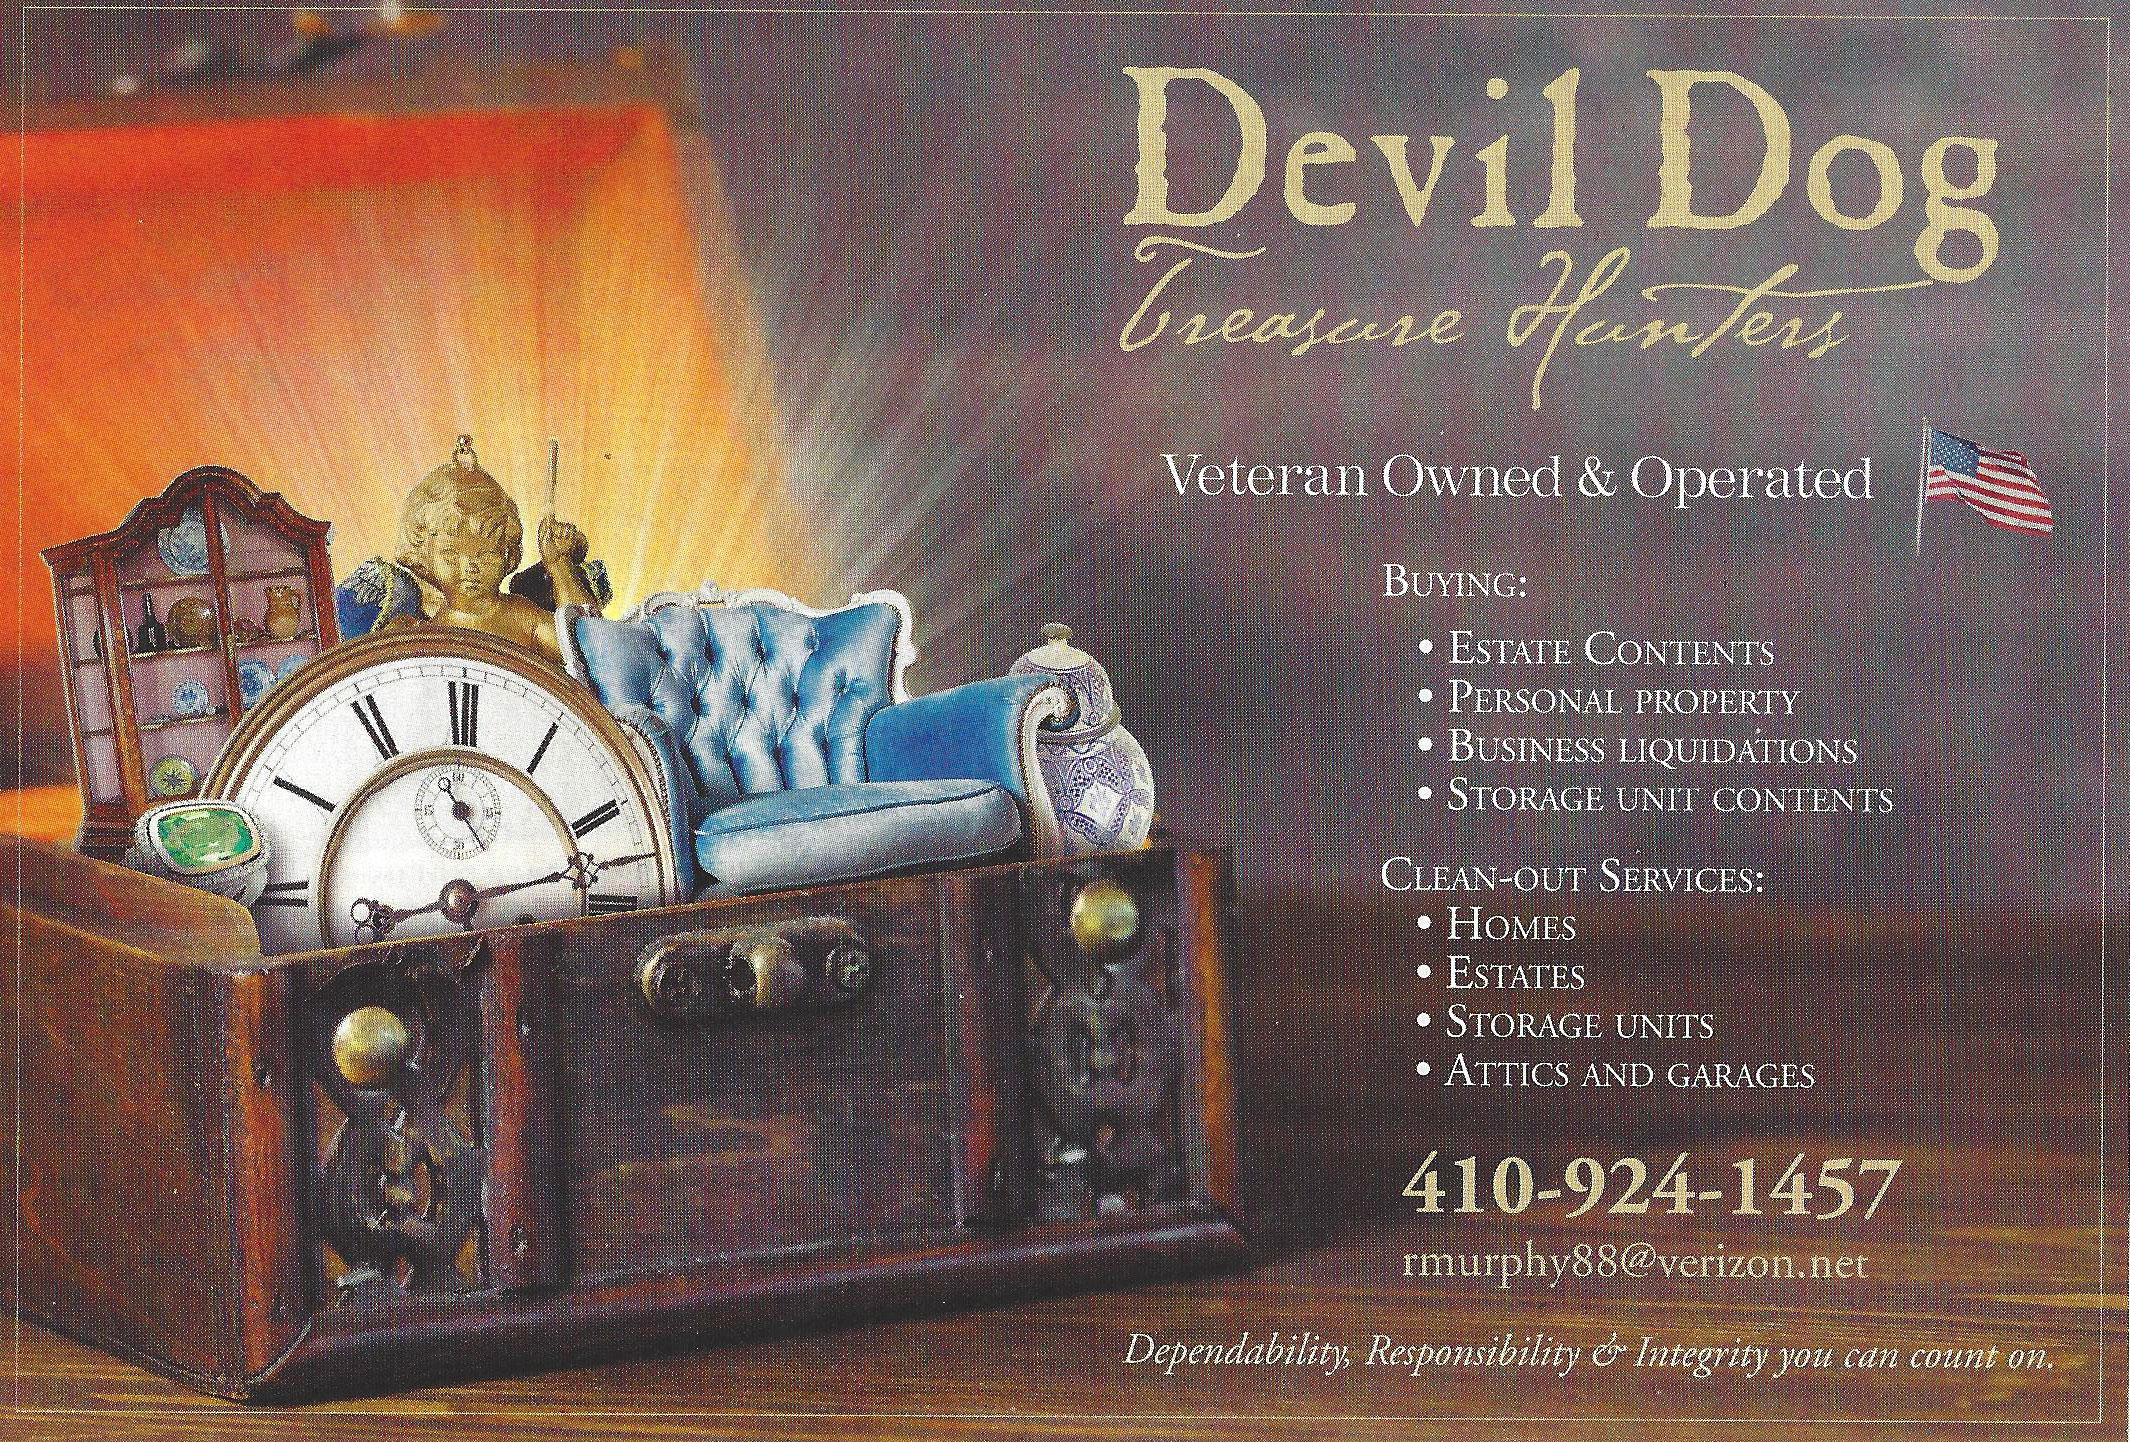 Devil Dog Treasure Hunters reviews | Appraisal Services at 102 Calvert St - Easton MD